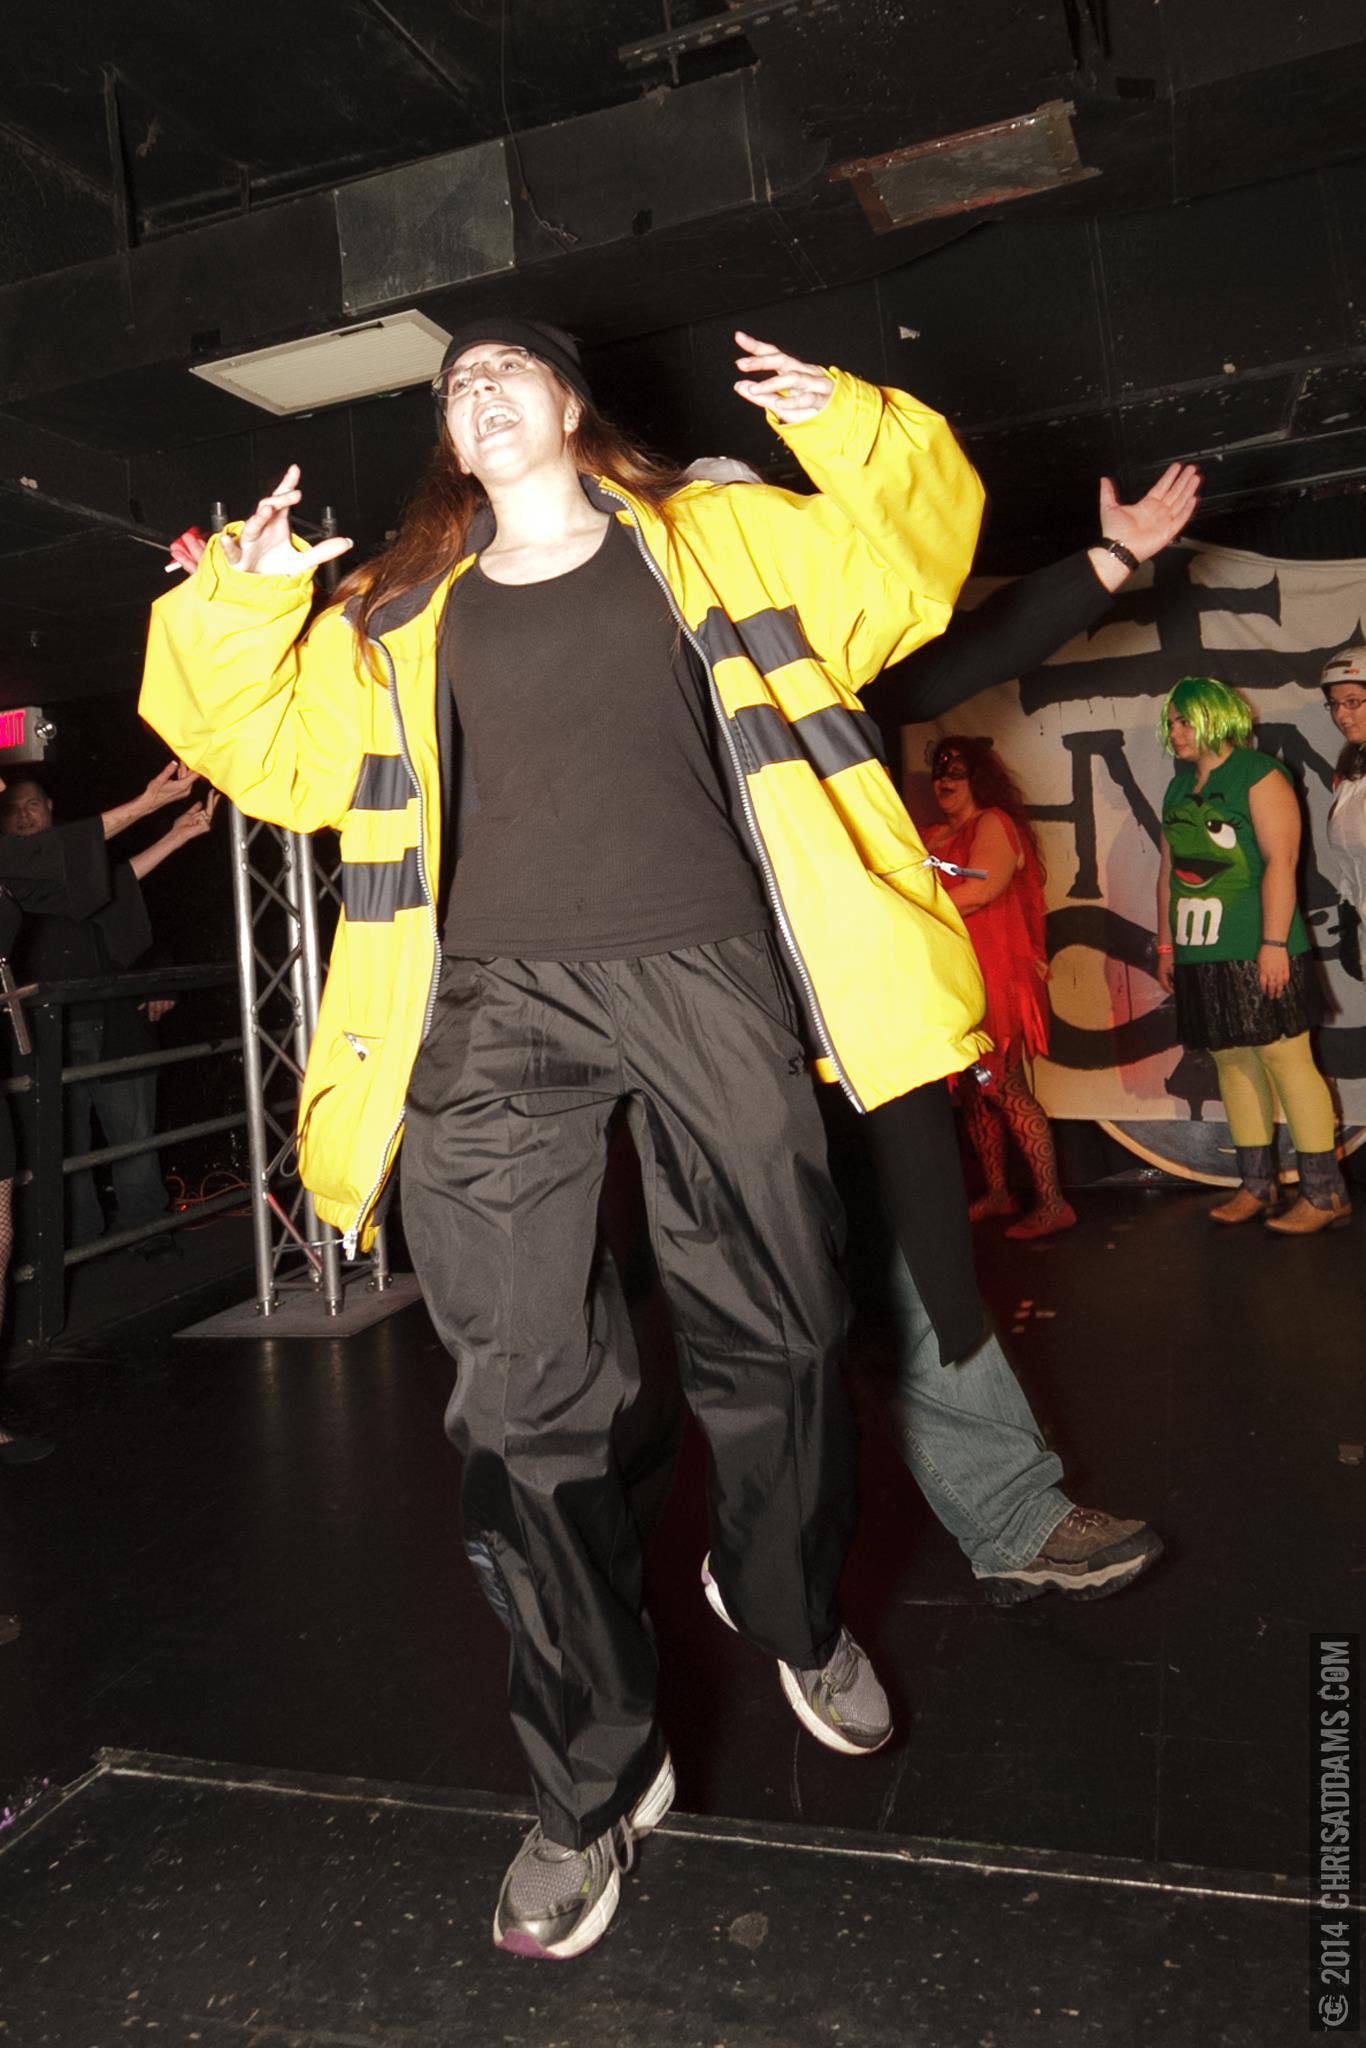 TheHavenClub-Goth-Industrial-Dance-Alternative-Northampton-MA (89).jpg